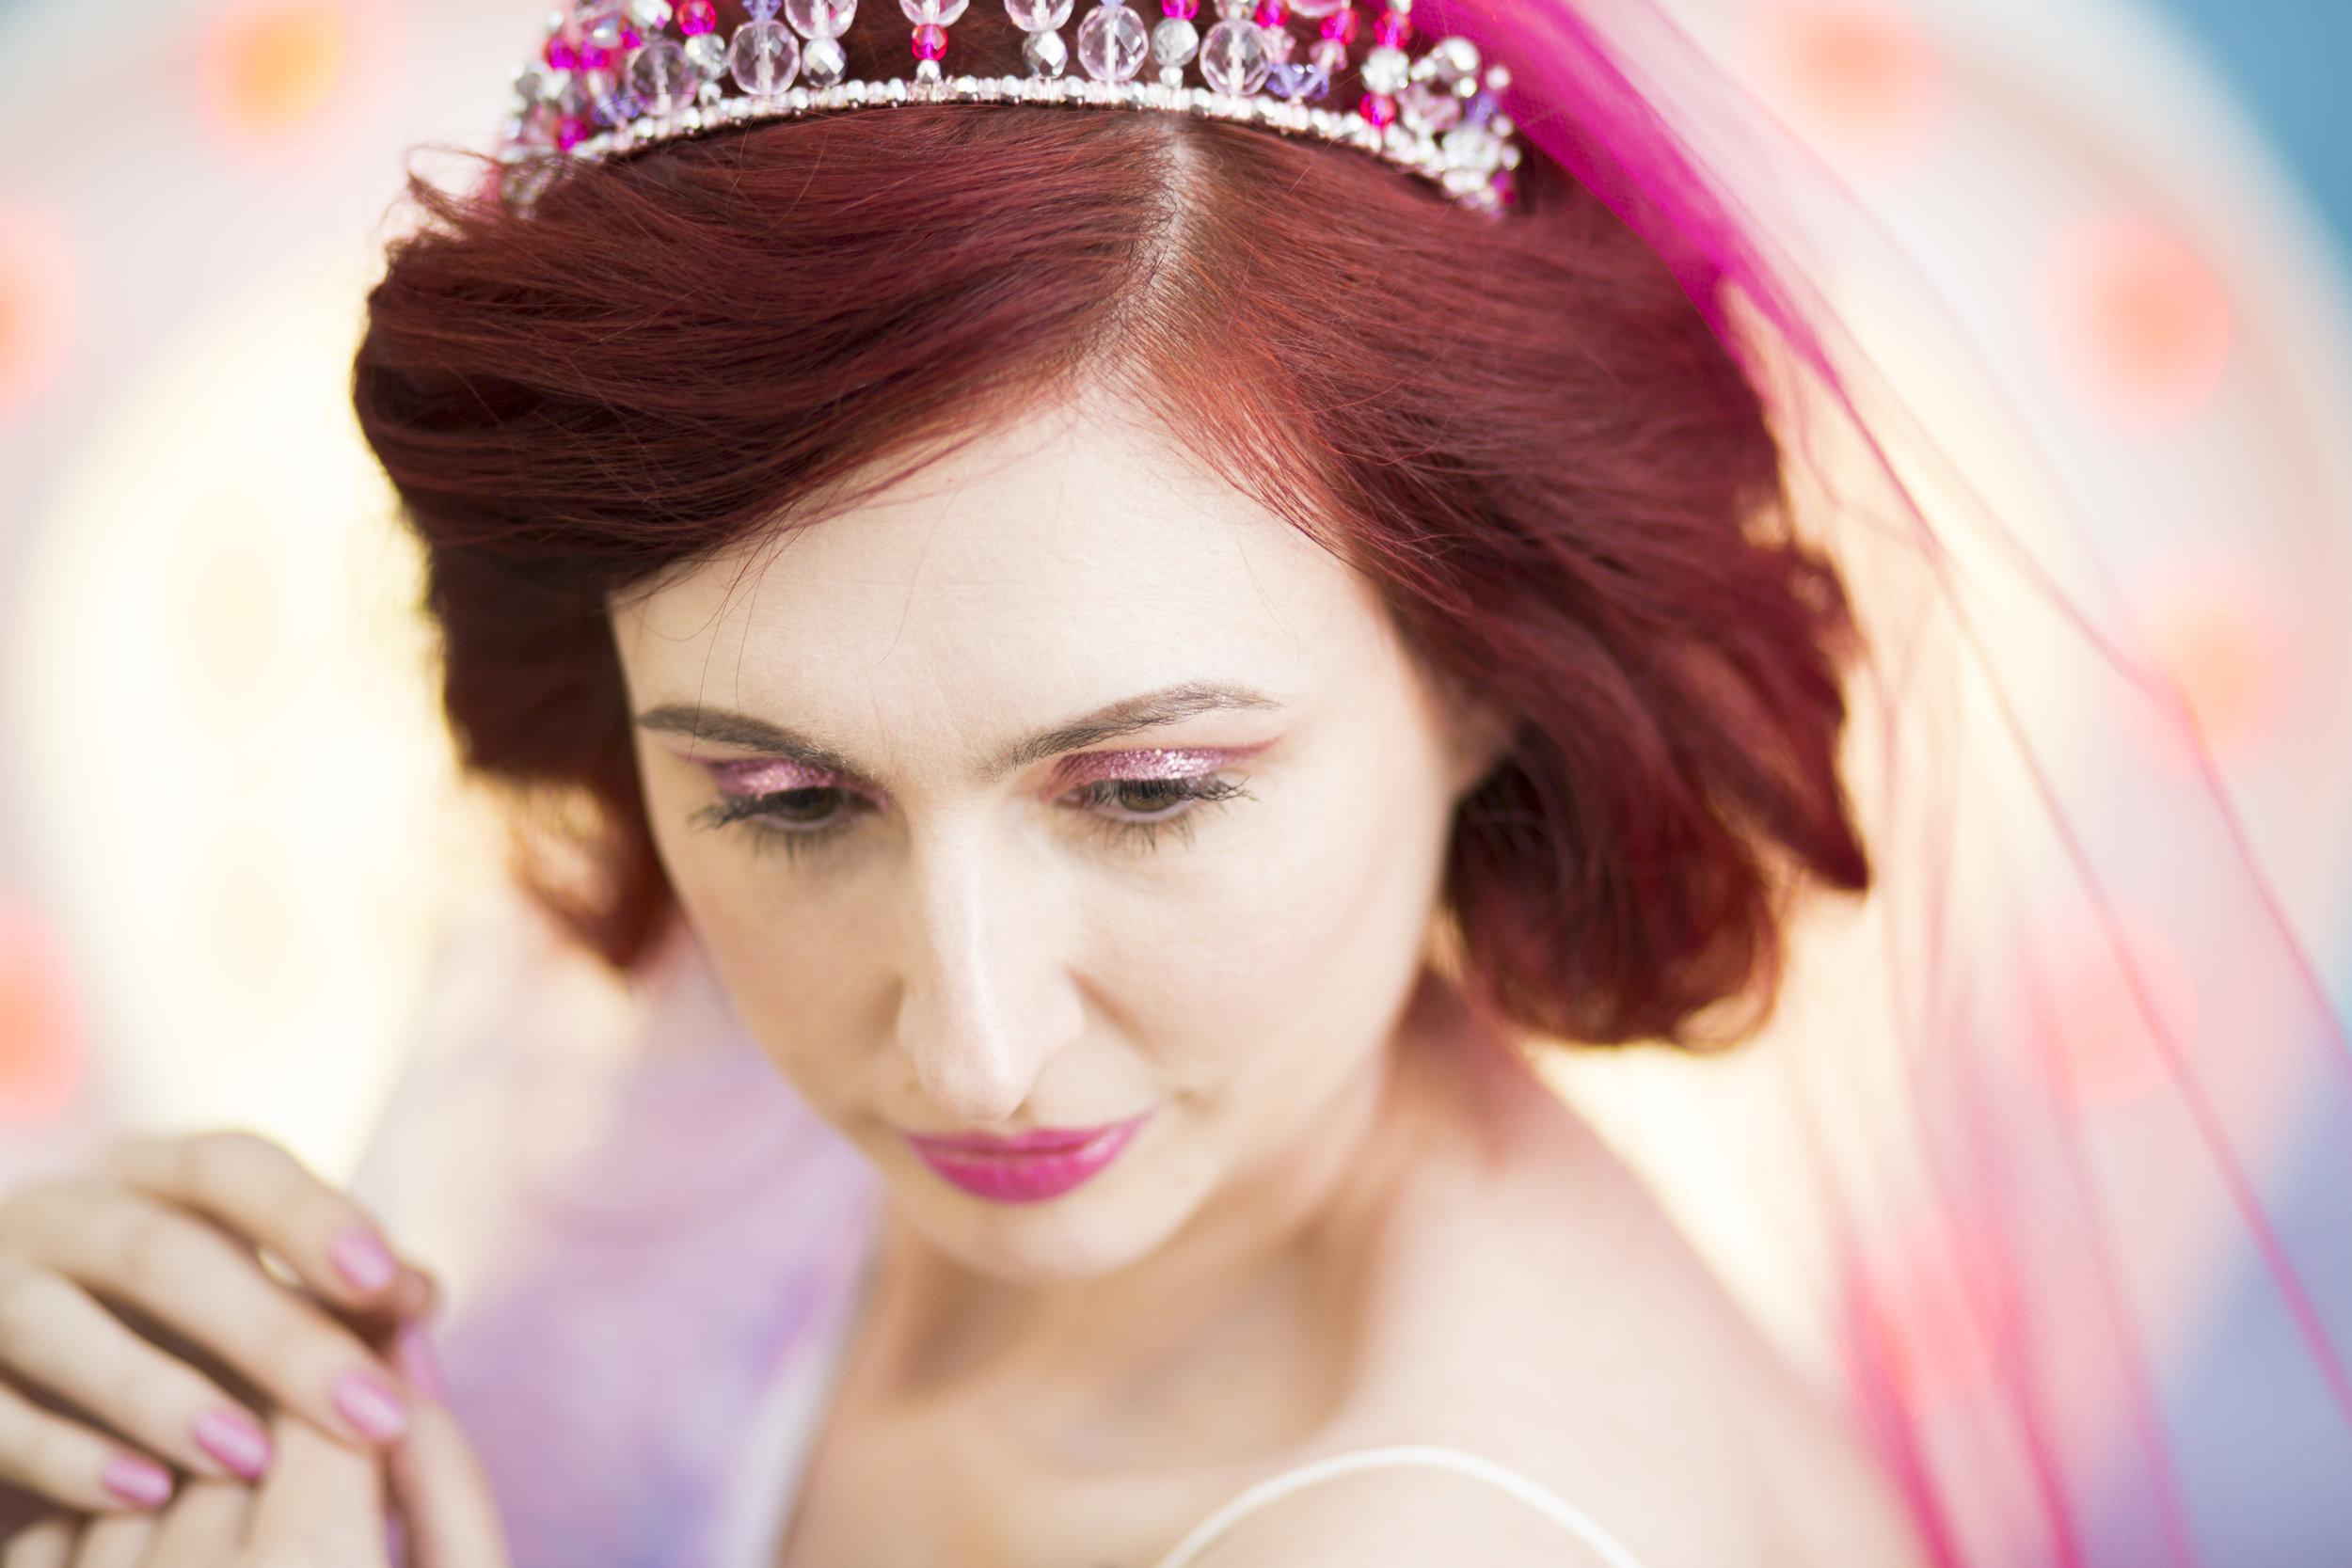 Prom Night Wedding Shoot Meadham Kirchhoff Carrie 00050.jpg